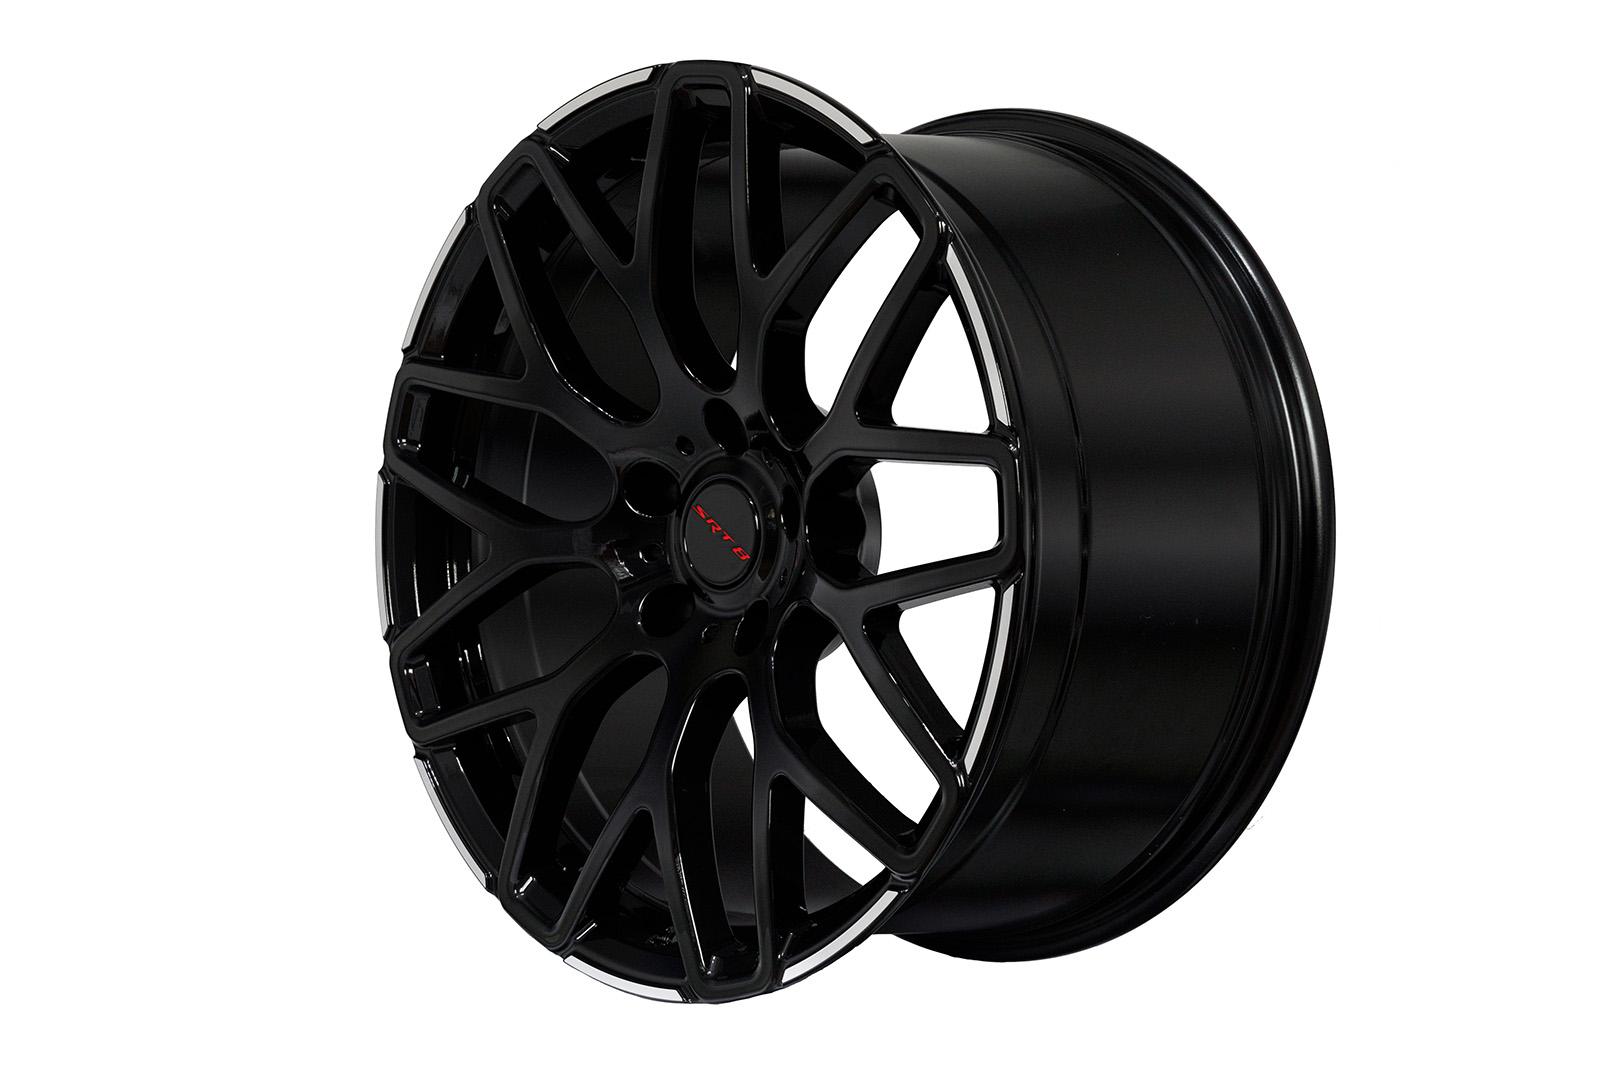 Rocksroad R9